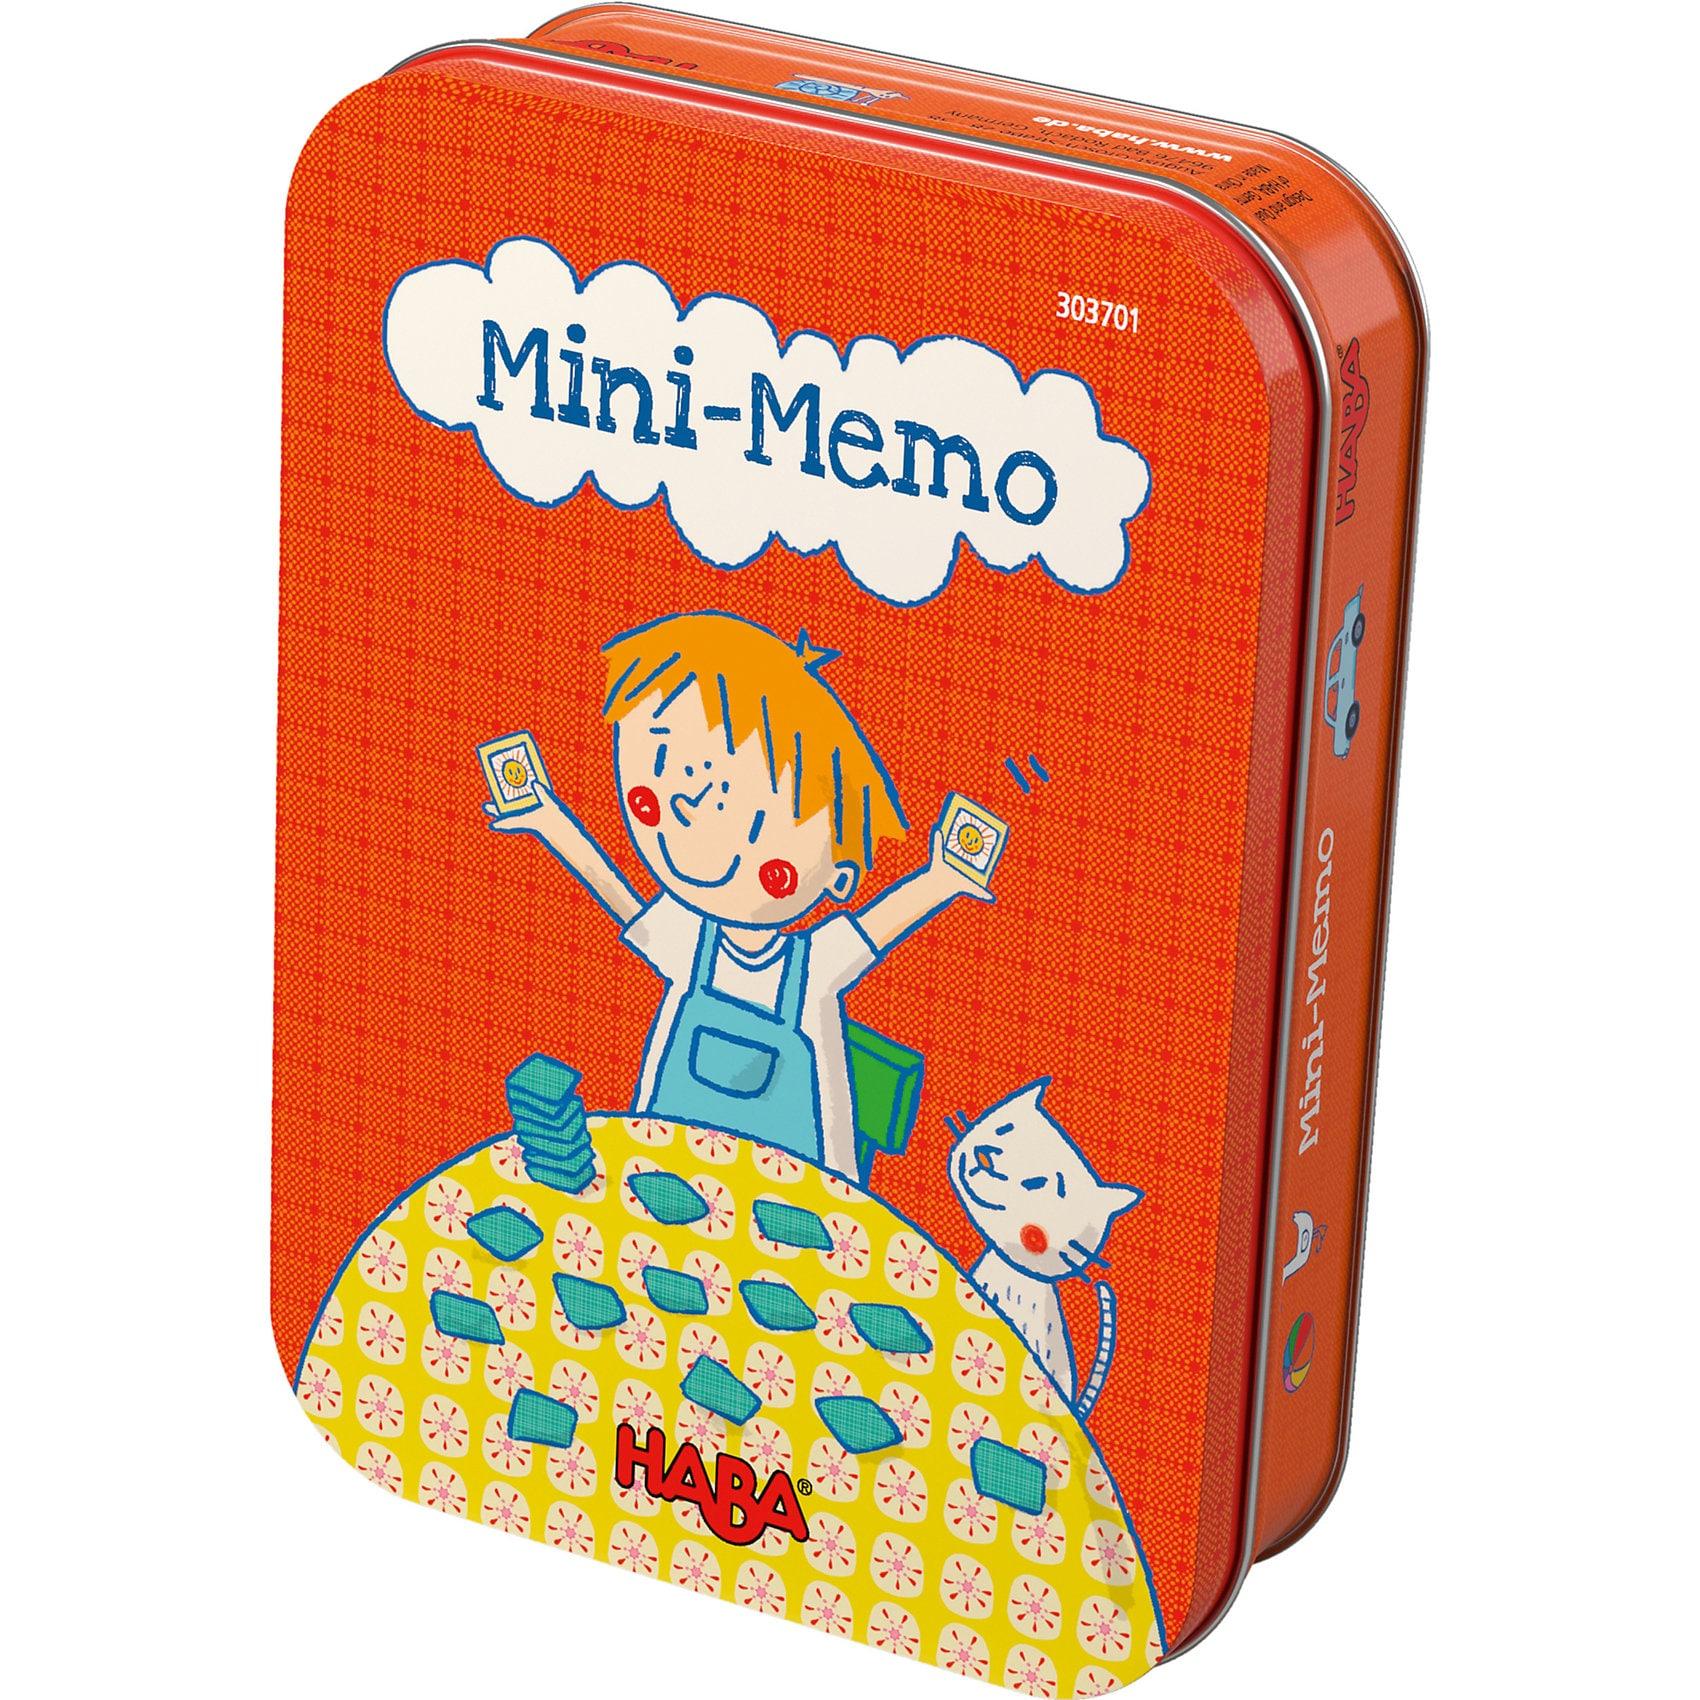 Haba Mini-Memo Mitbringspiel